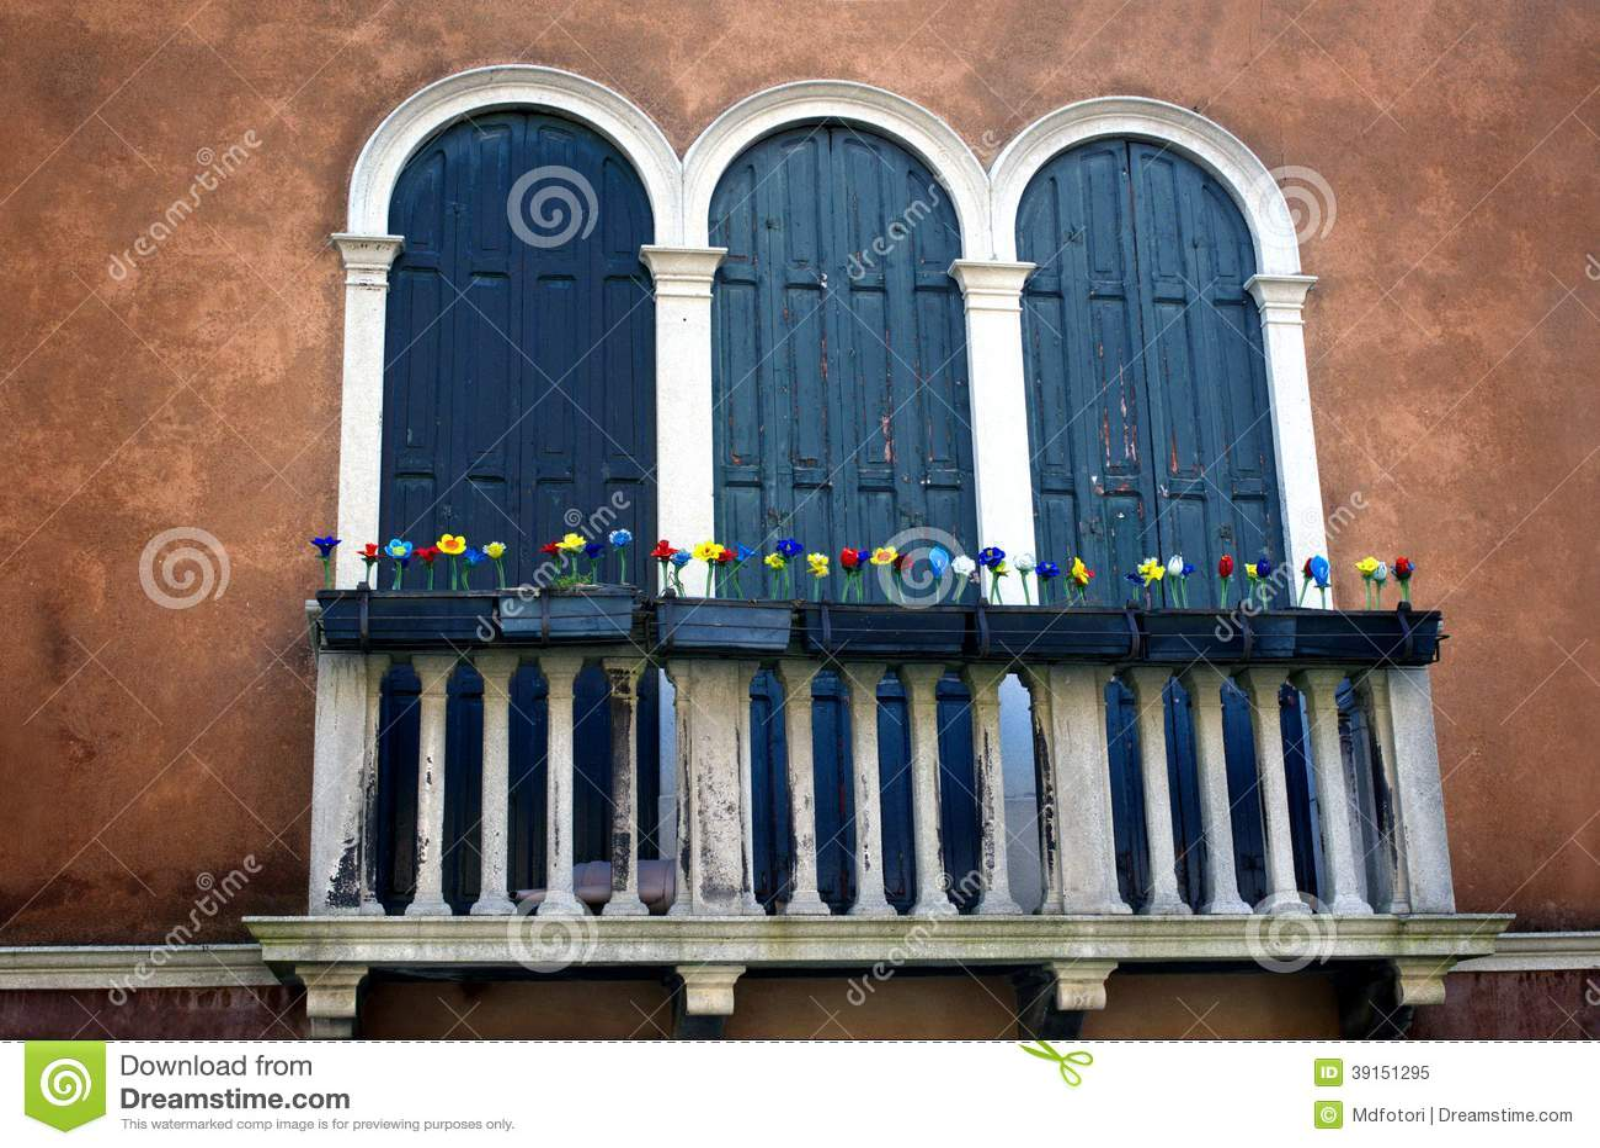 Antique Windows Antique Windows And Balcony In Venice Stock Photo Image 39151295